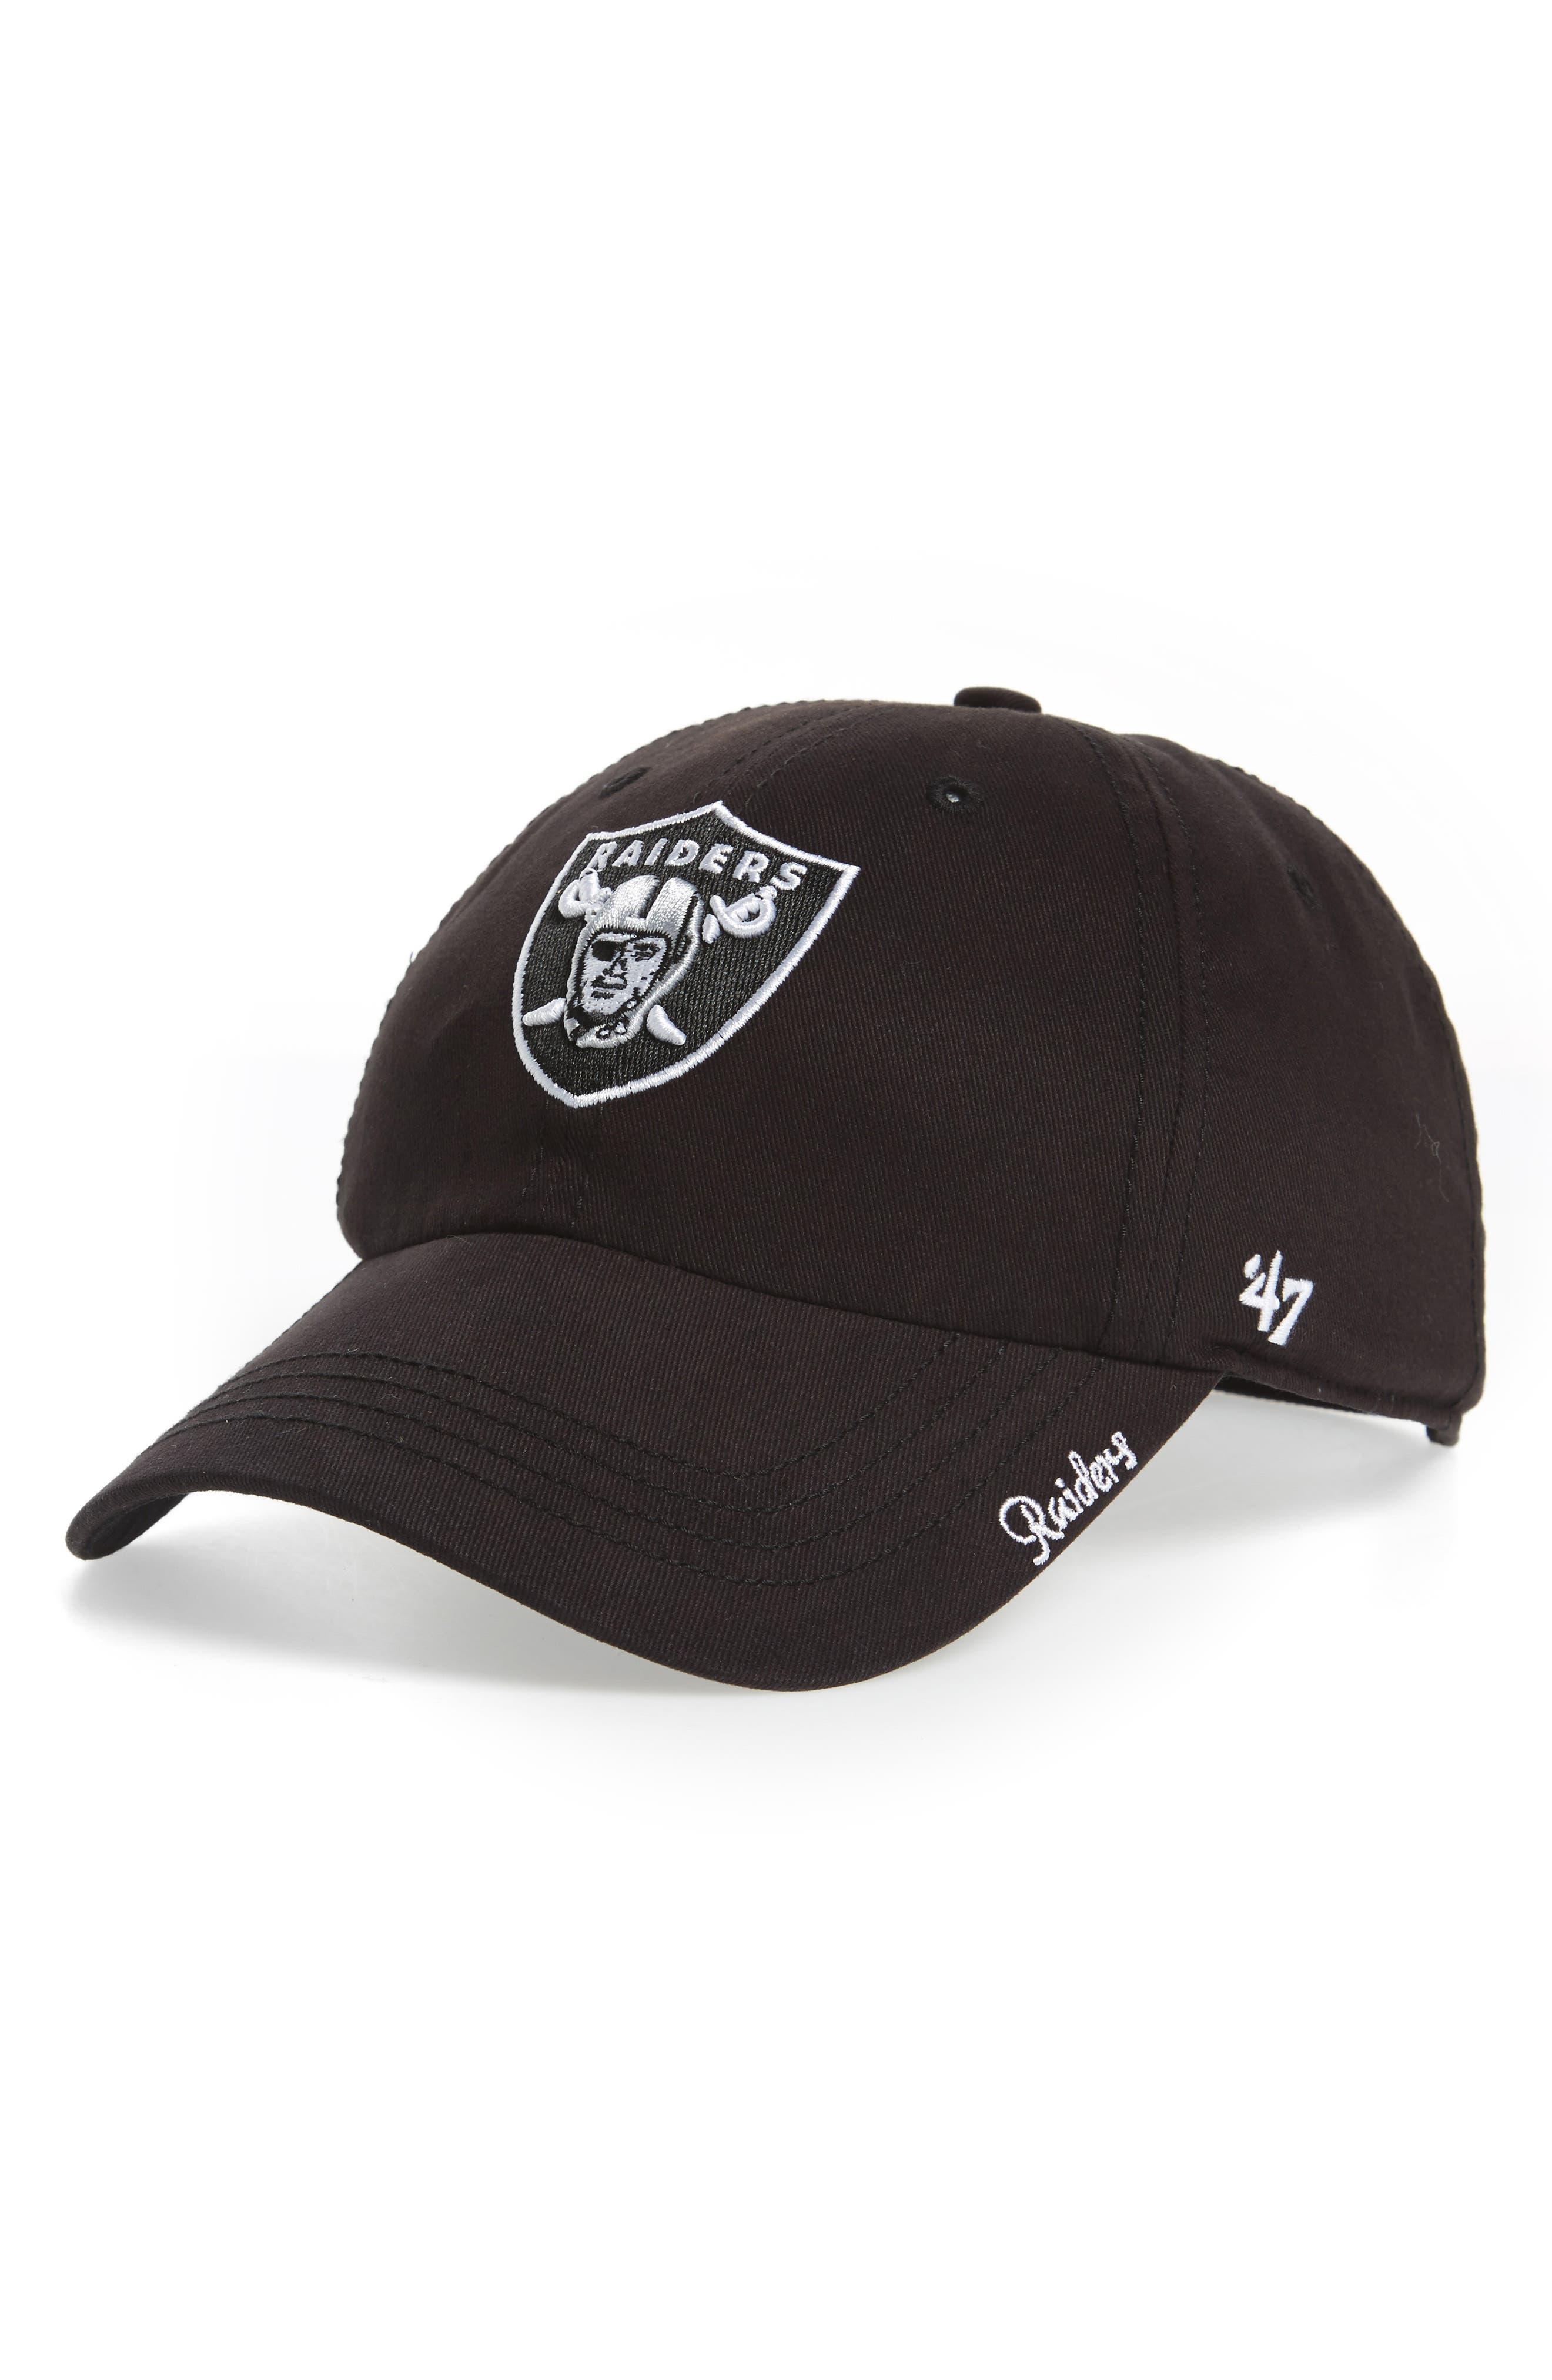 Miata Clean Up Oakland Raiders Ball Cap,                         Main,                         color, Black